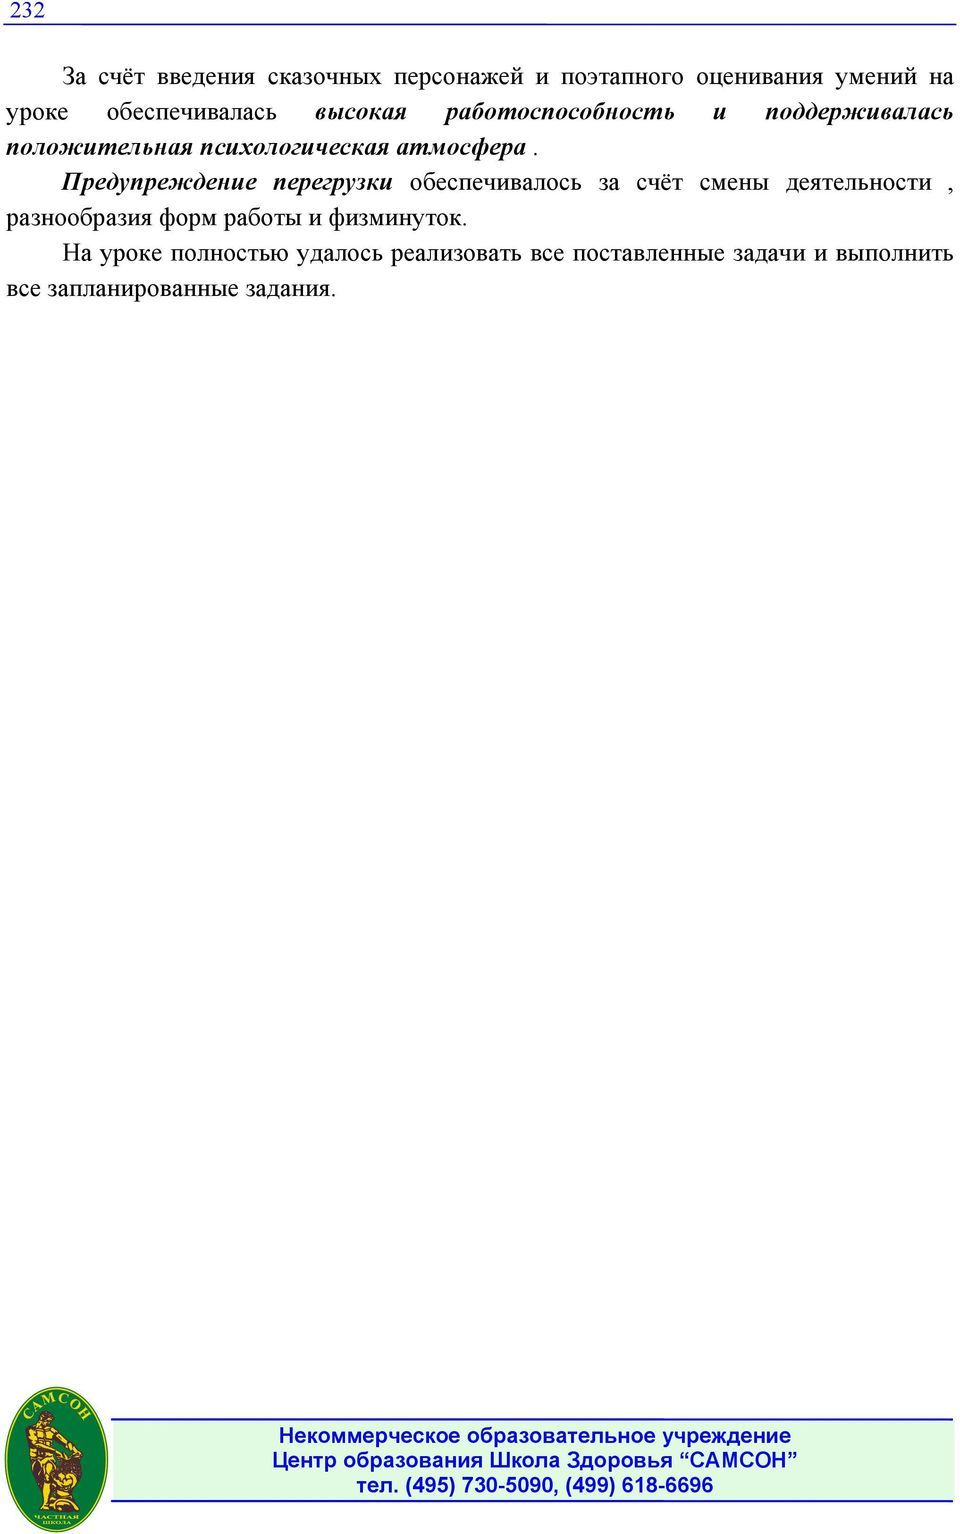 Гдз на рабочую тетрадь по химии класс о.с.габриелян, а.в.яшукова